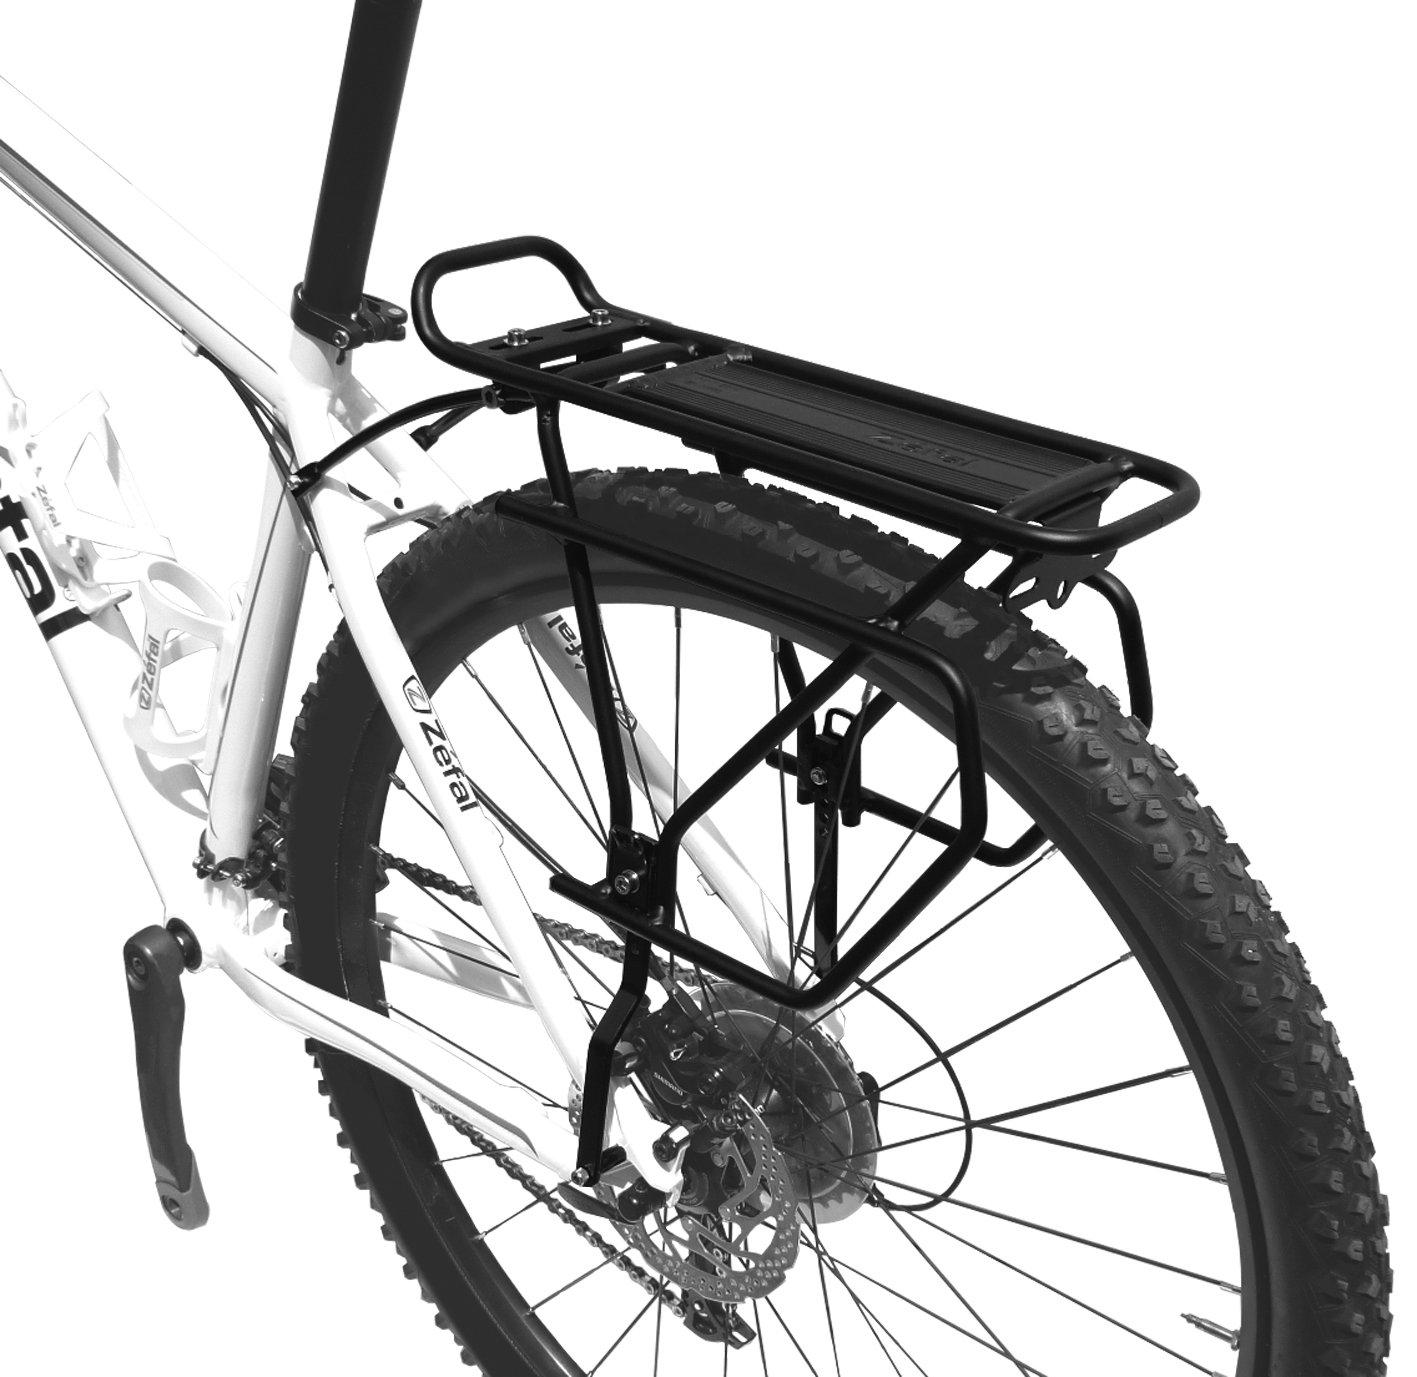 Zefal Raider R70Bicicleta /& MTB Portaequipajes